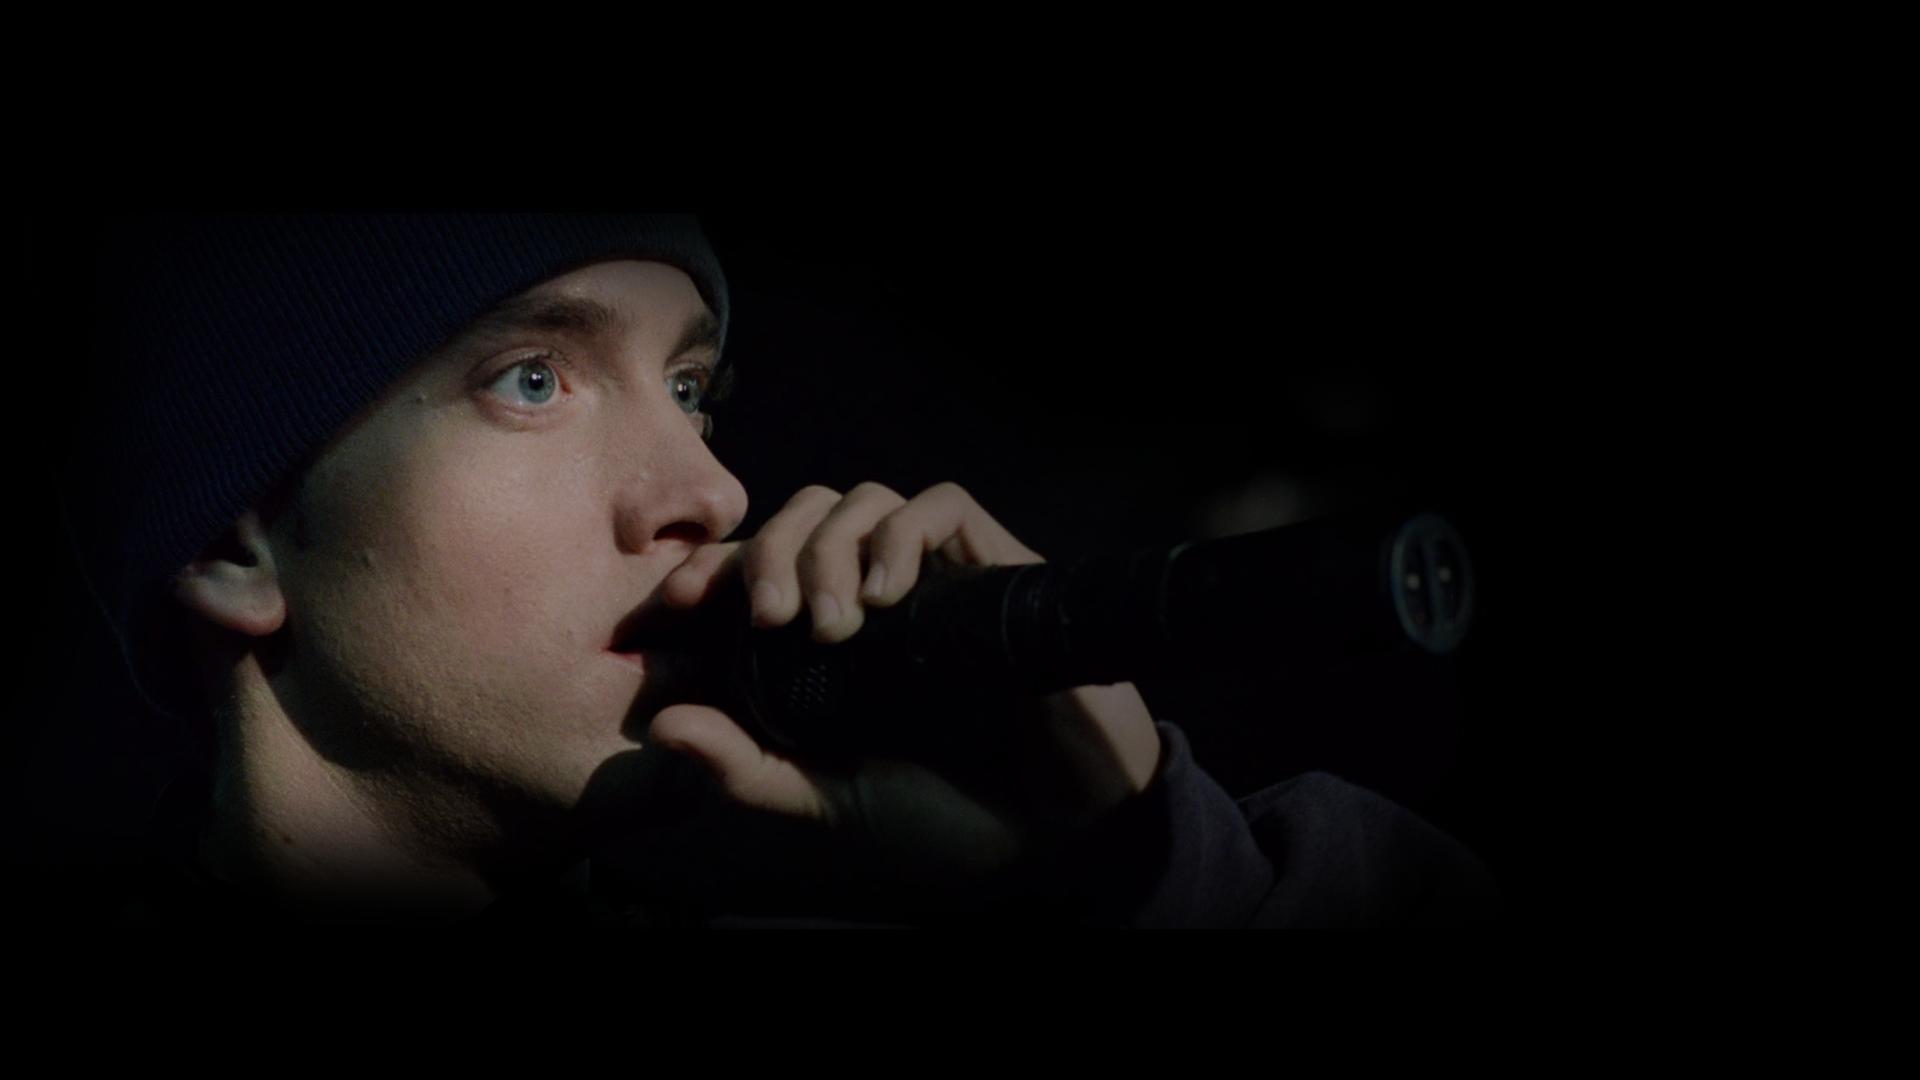 Eminem 1080p 8 Mile WALLPAPER   Imgur 1920x1080